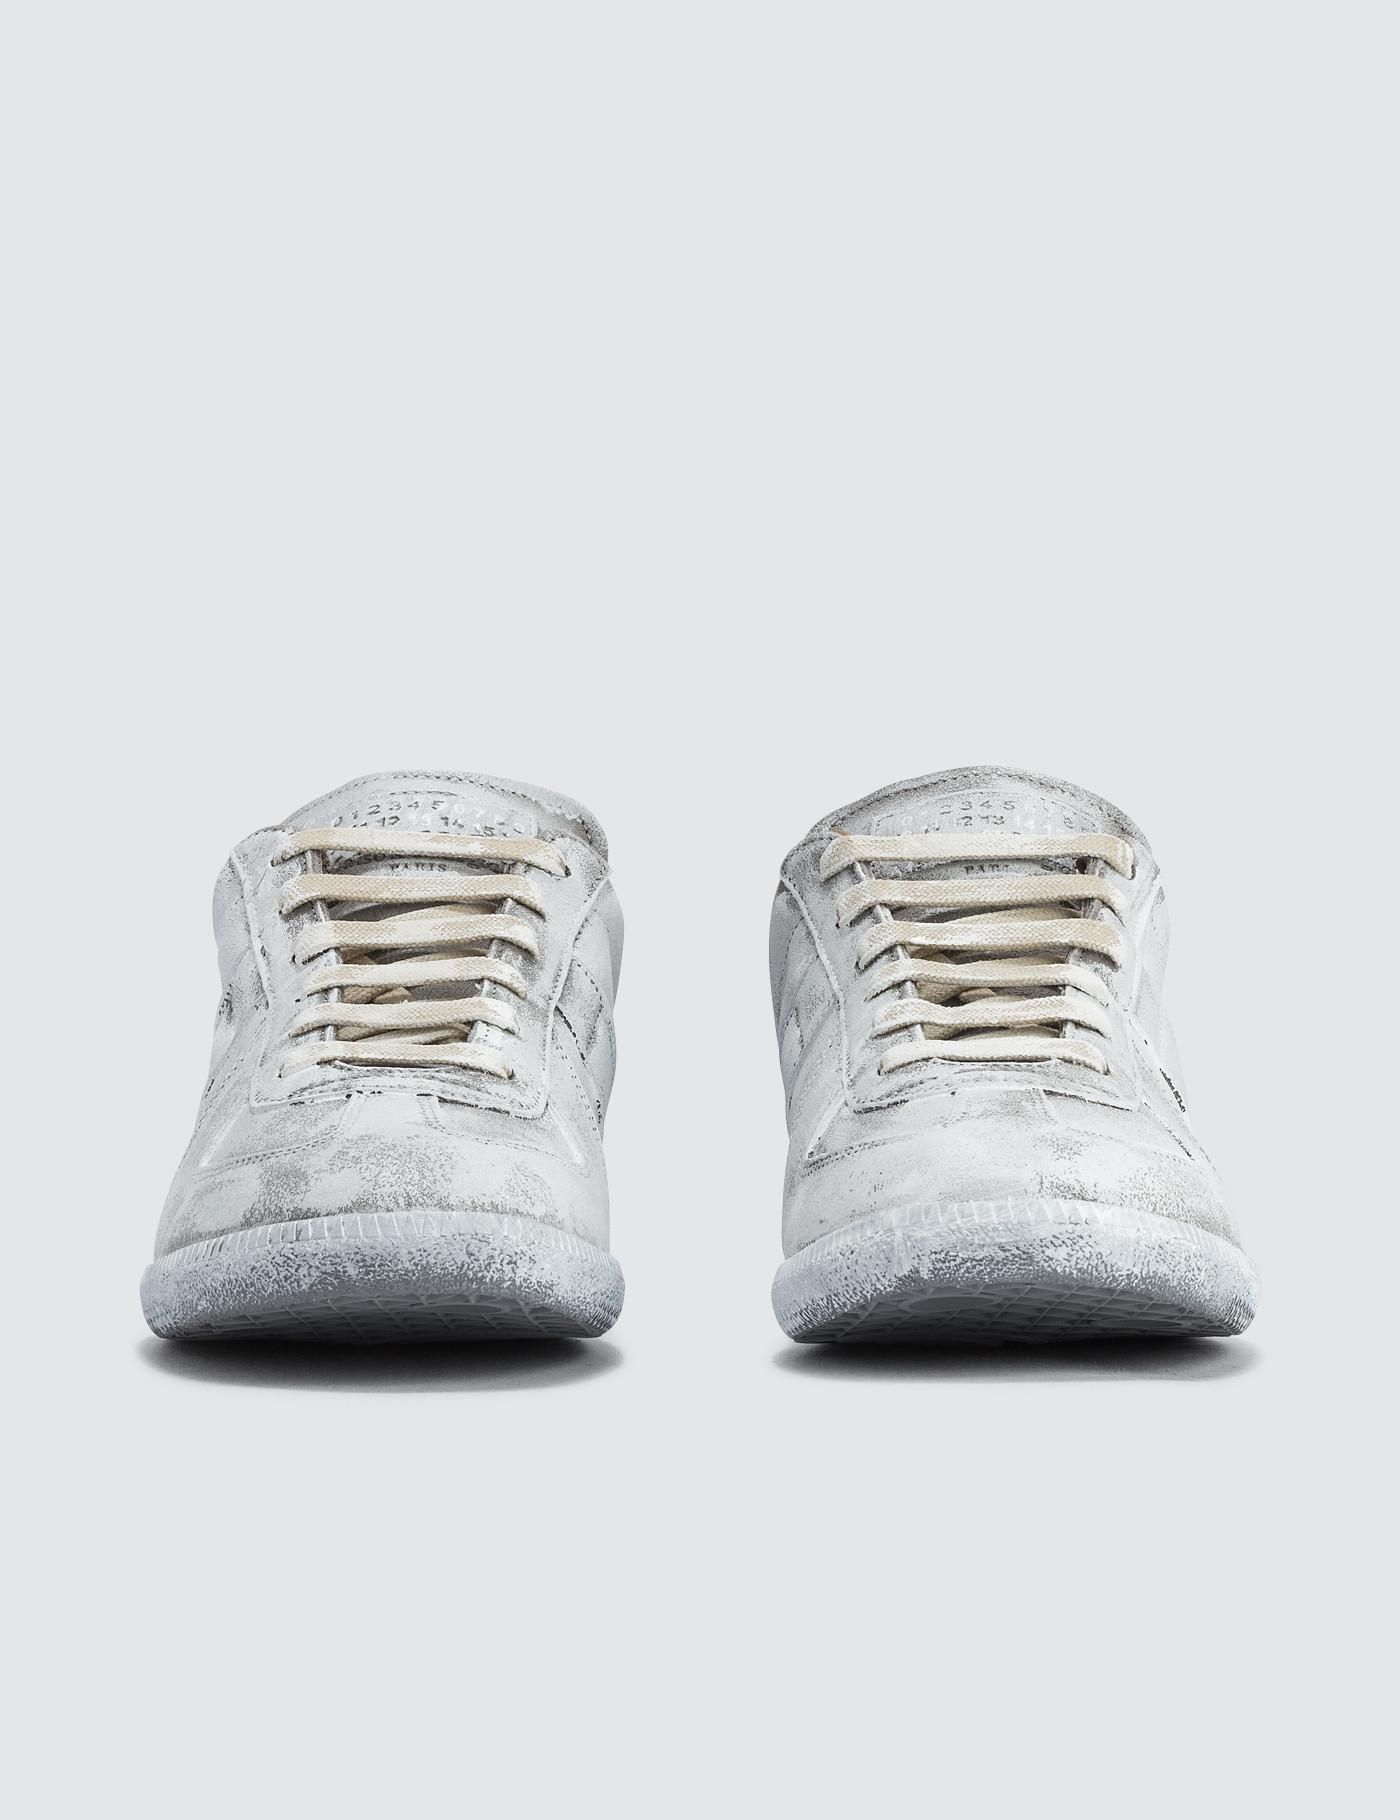 Maison Margiela Replica Leather Low Top Sneakers in Grey (Grey) for Men